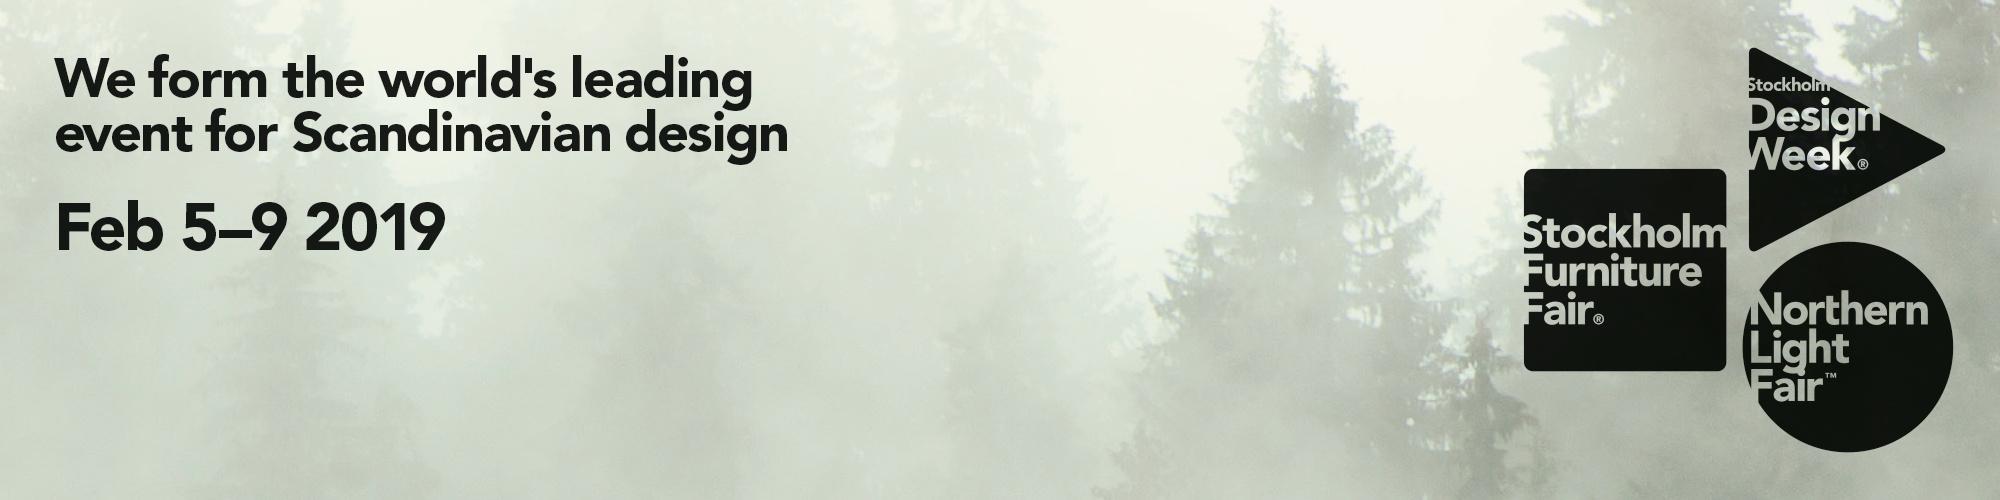 new-sweden-design-award-01